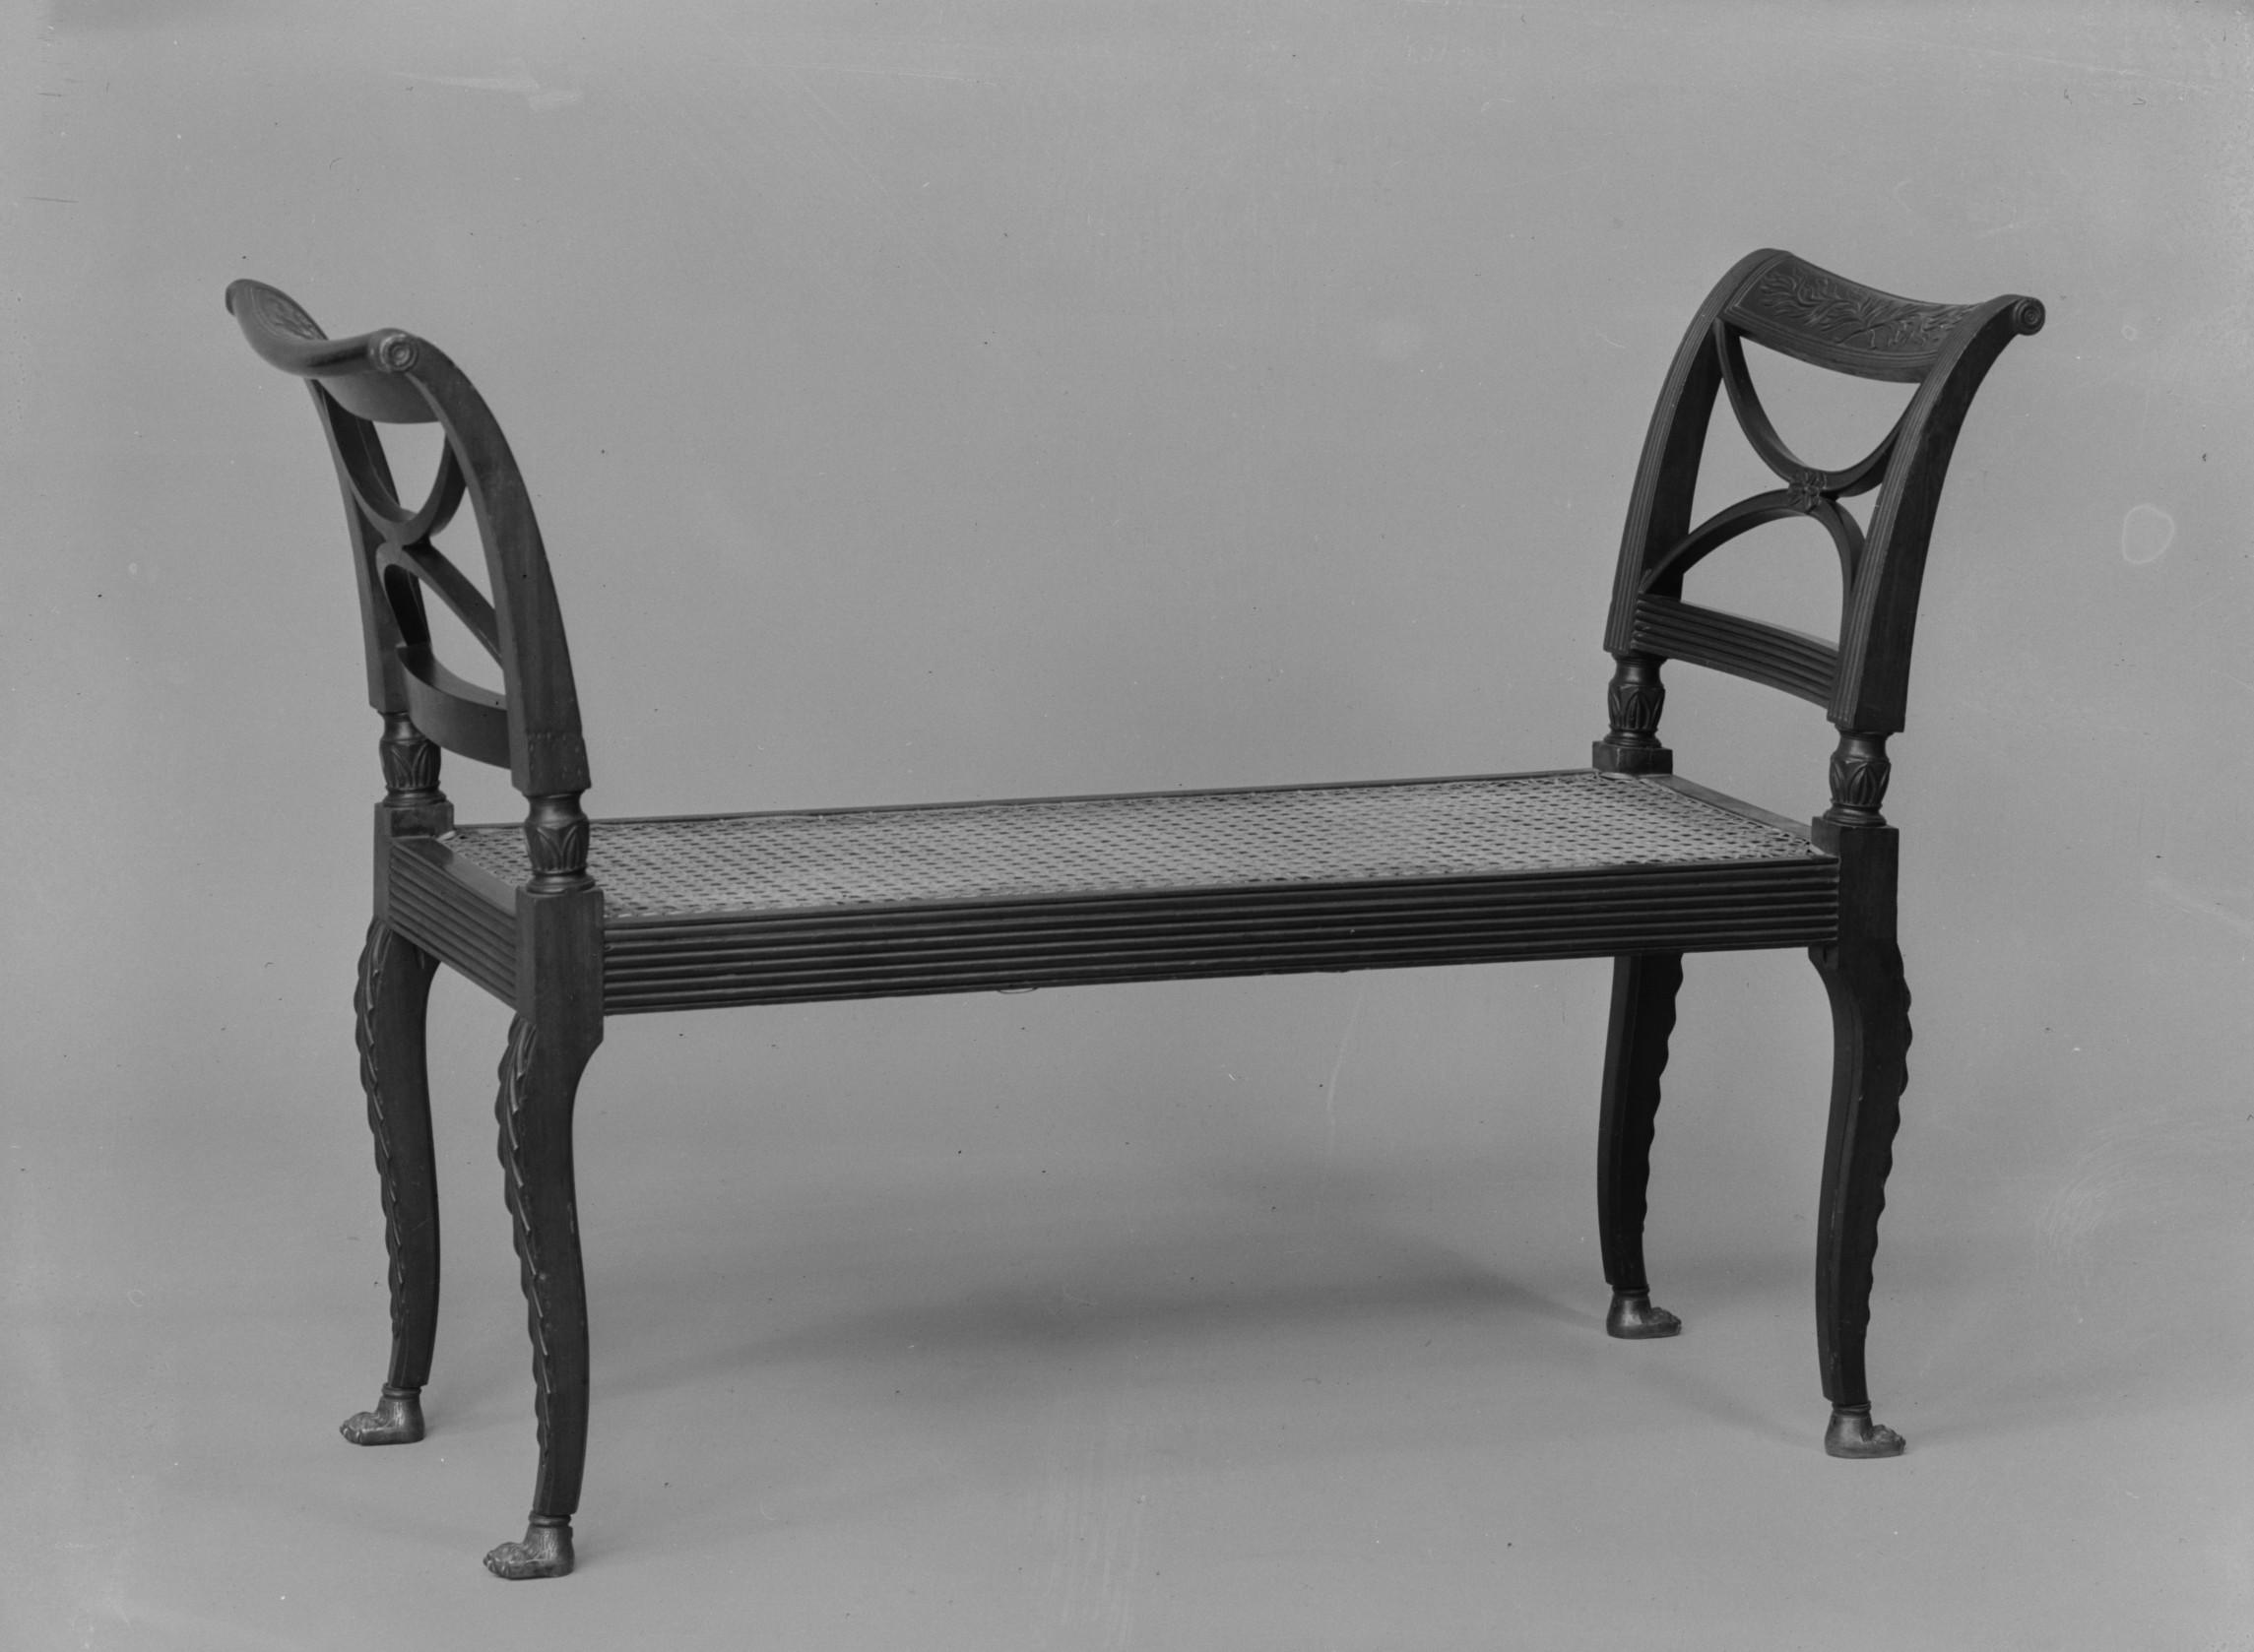 Pleasing Window Seat Type Of Sofa Wikipedia Machost Co Dining Chair Design Ideas Machostcouk